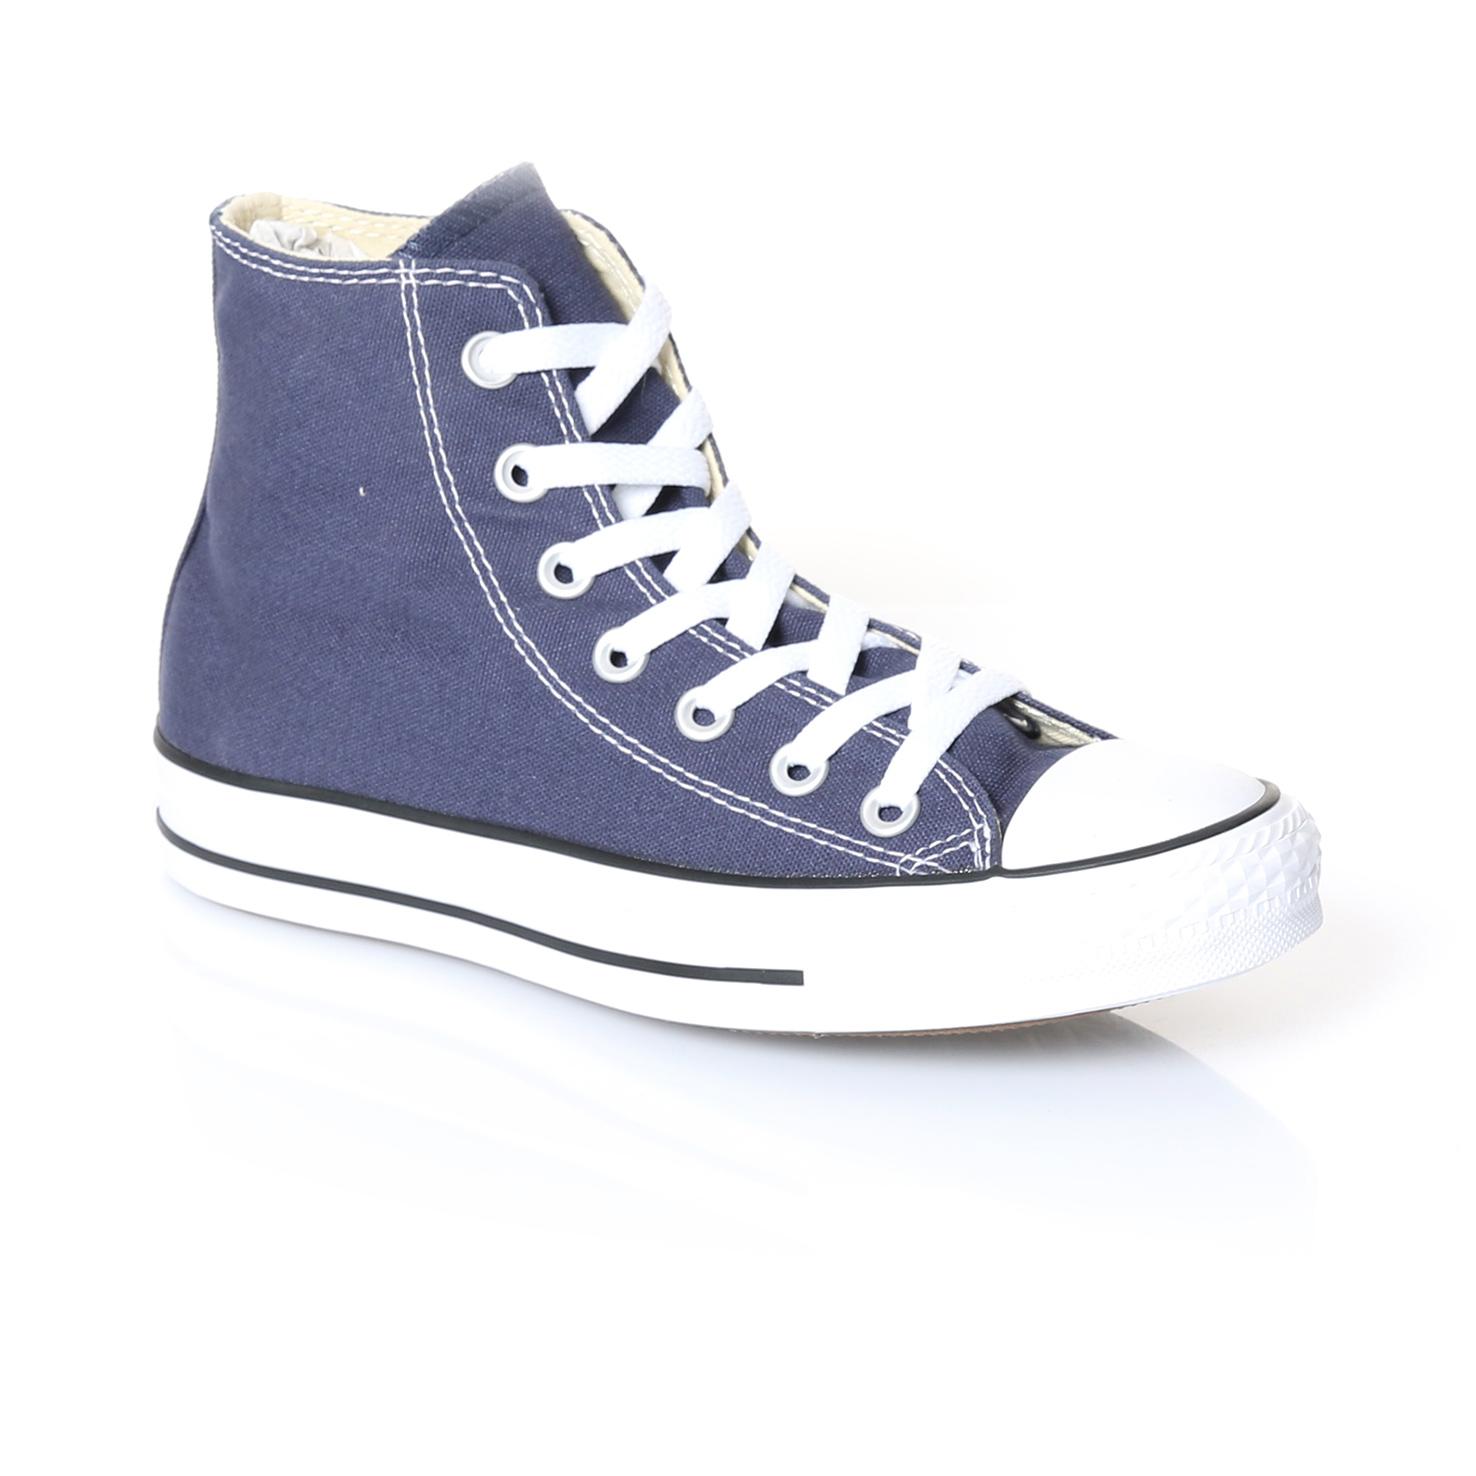 b6f3c5c6e7972 Converse Chuck Taylor All Star Mid Unisex Lacivert Sneaker.M9622C.410